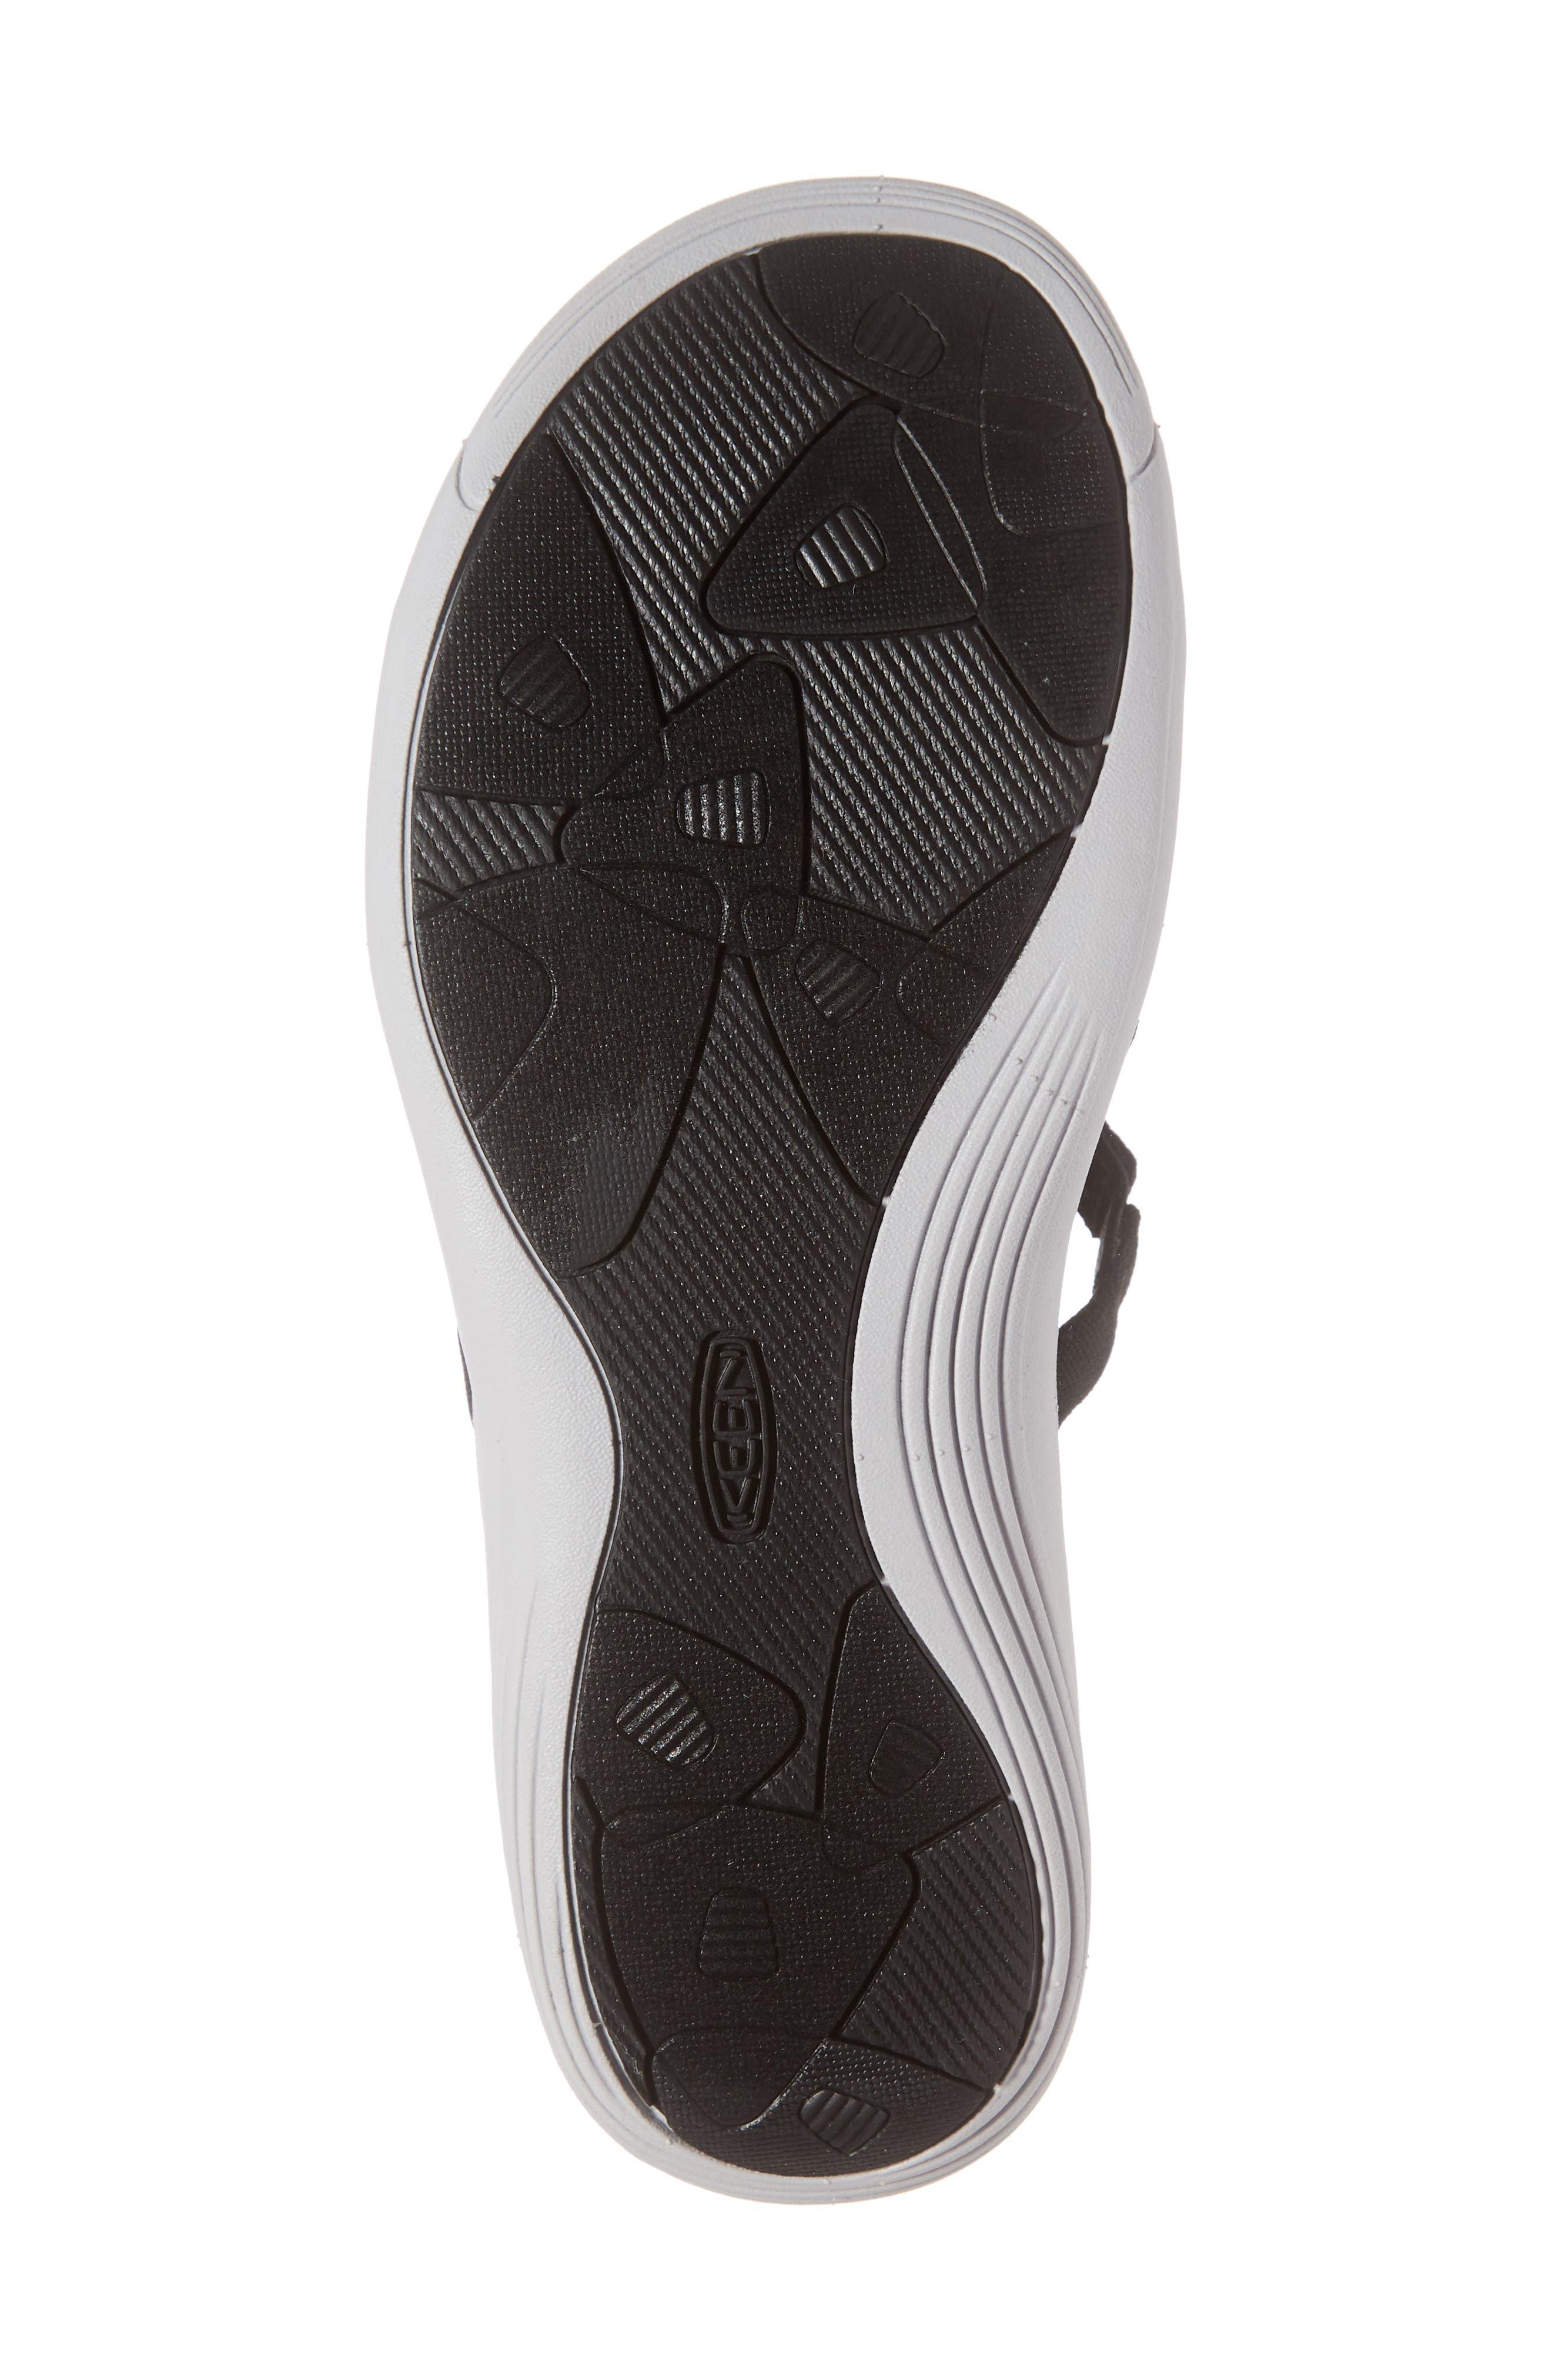 KEEN, Damaya Slide Sandal, Alternate thumbnail 6, color, BLACK/ VAPOR BLUE FABRIC